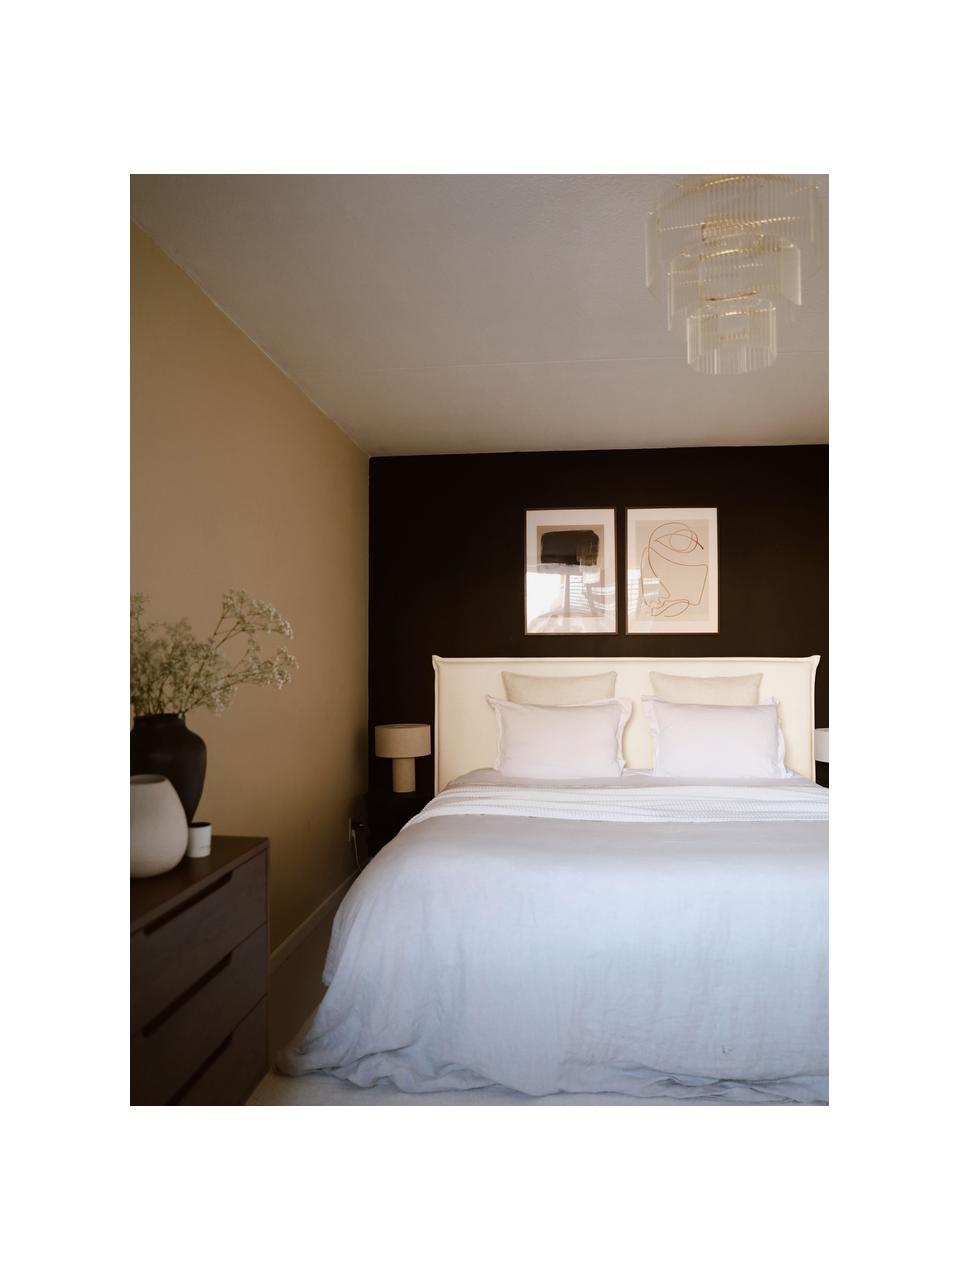 Cama continental Premium Violet, Patas: madera de abedul maciza p, Tejido blanco crema, 140 x 200 cm